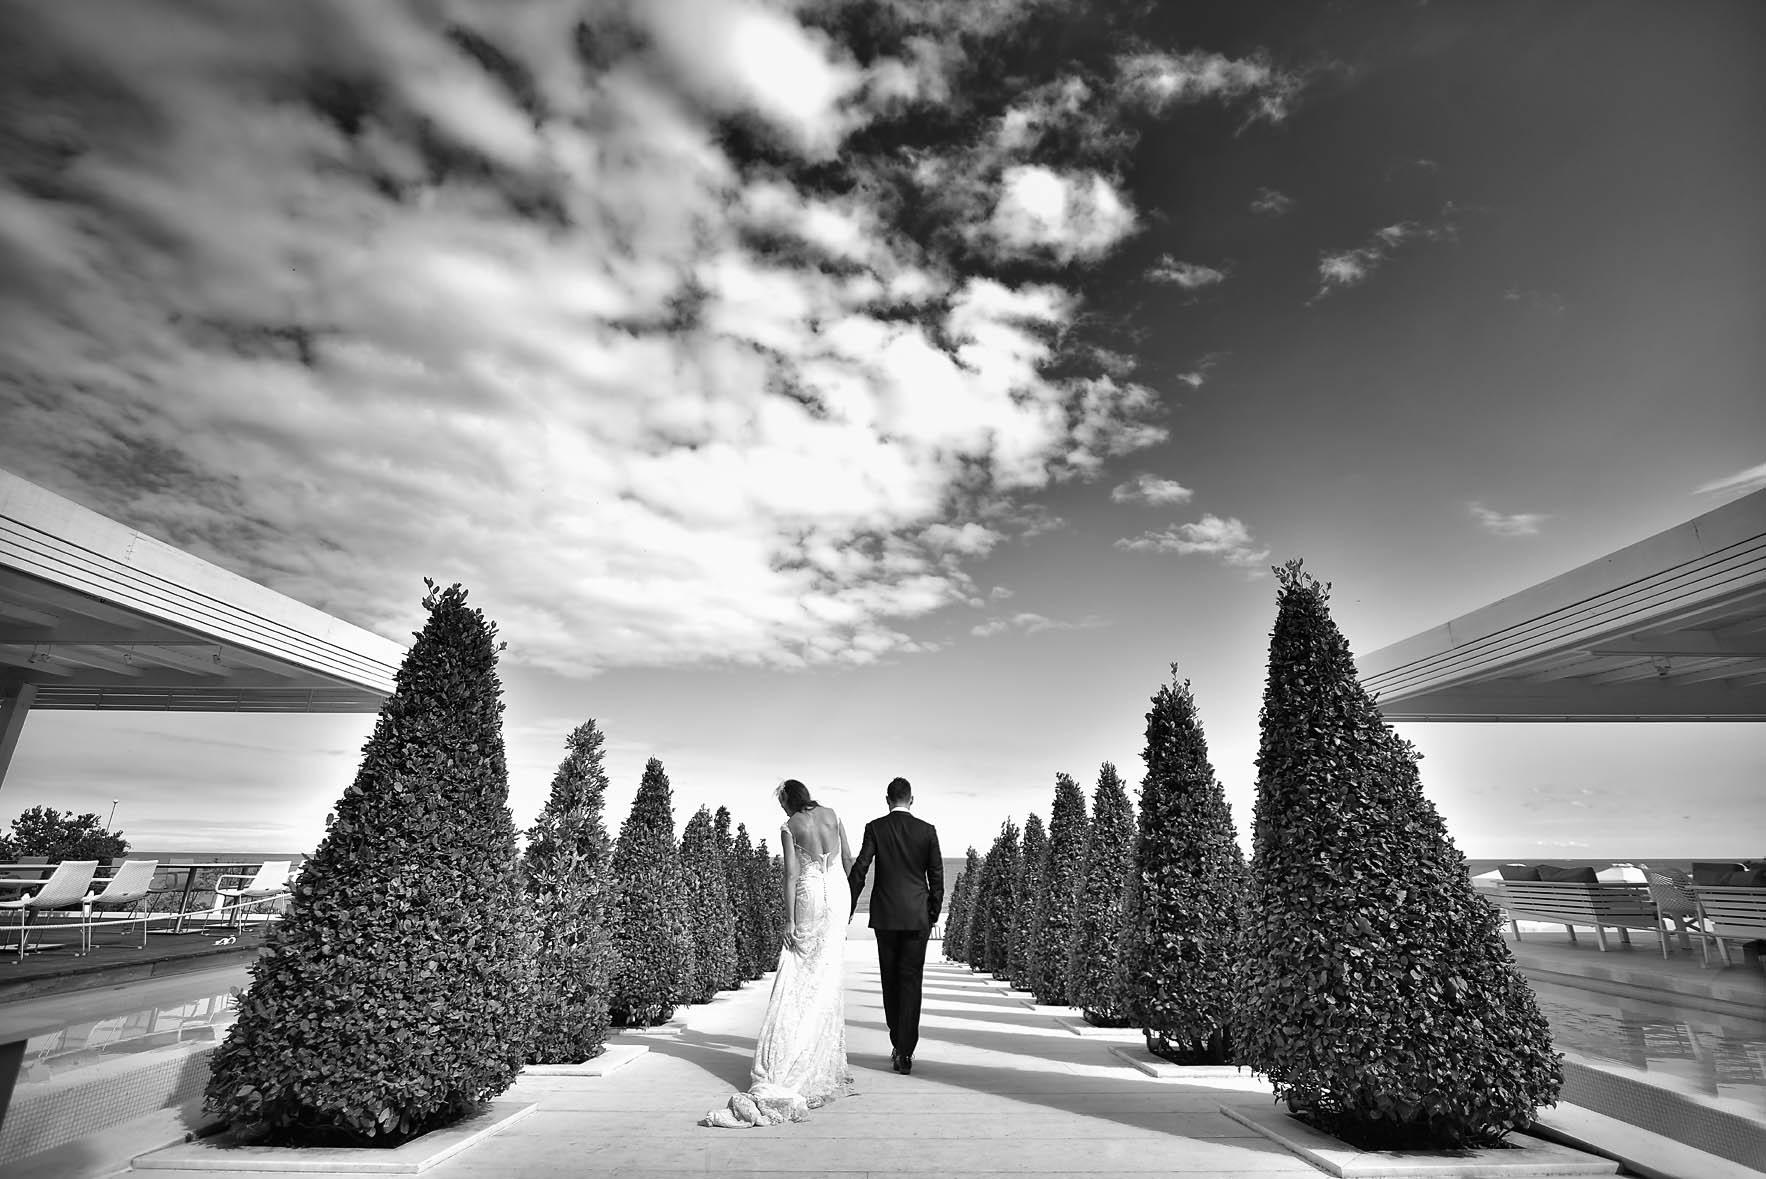 fine-art-photography-wedding-Cavo Olympo-pool-01